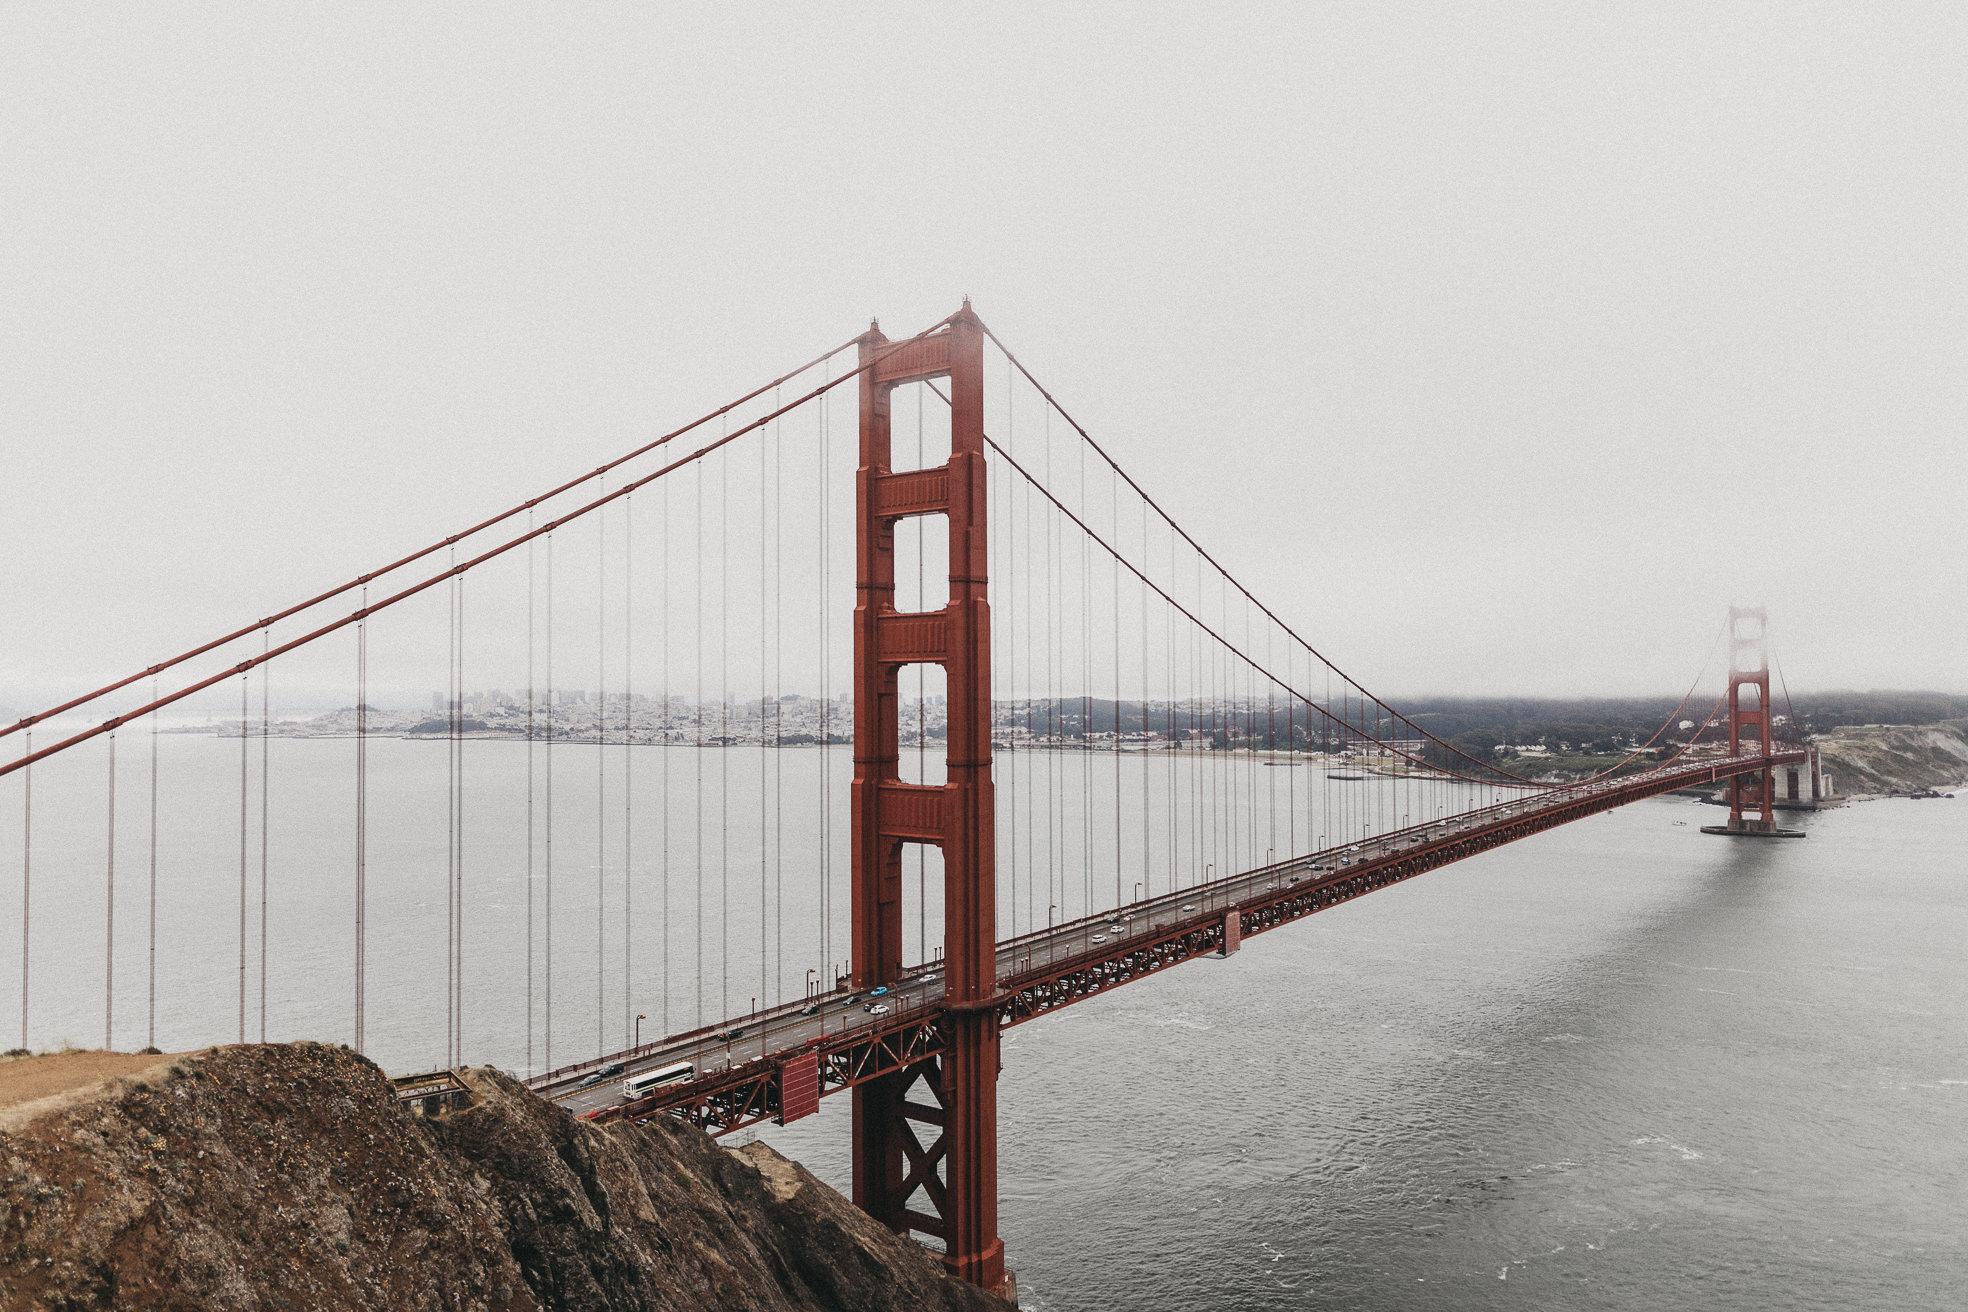 San-Francisco-BildervomLeben-7483